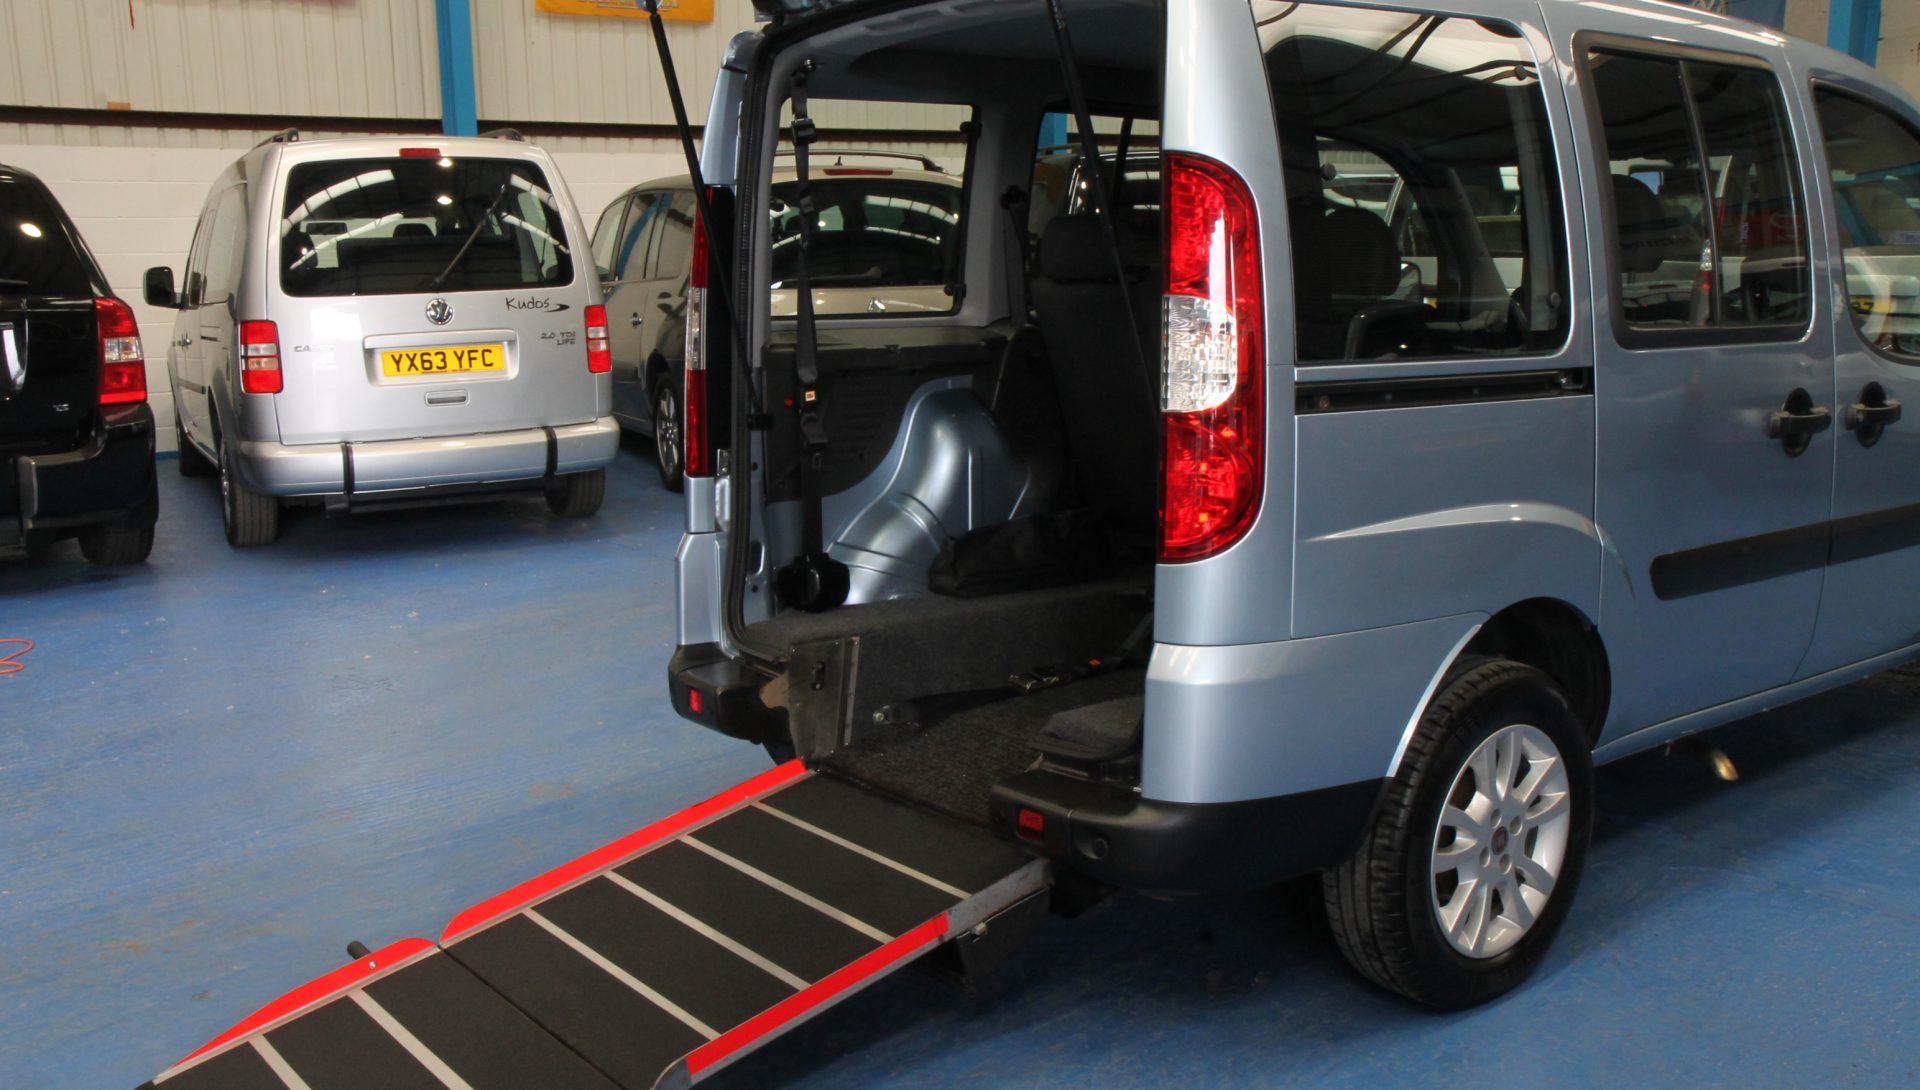 Doblo Wheelchair accessible vehicle yn08